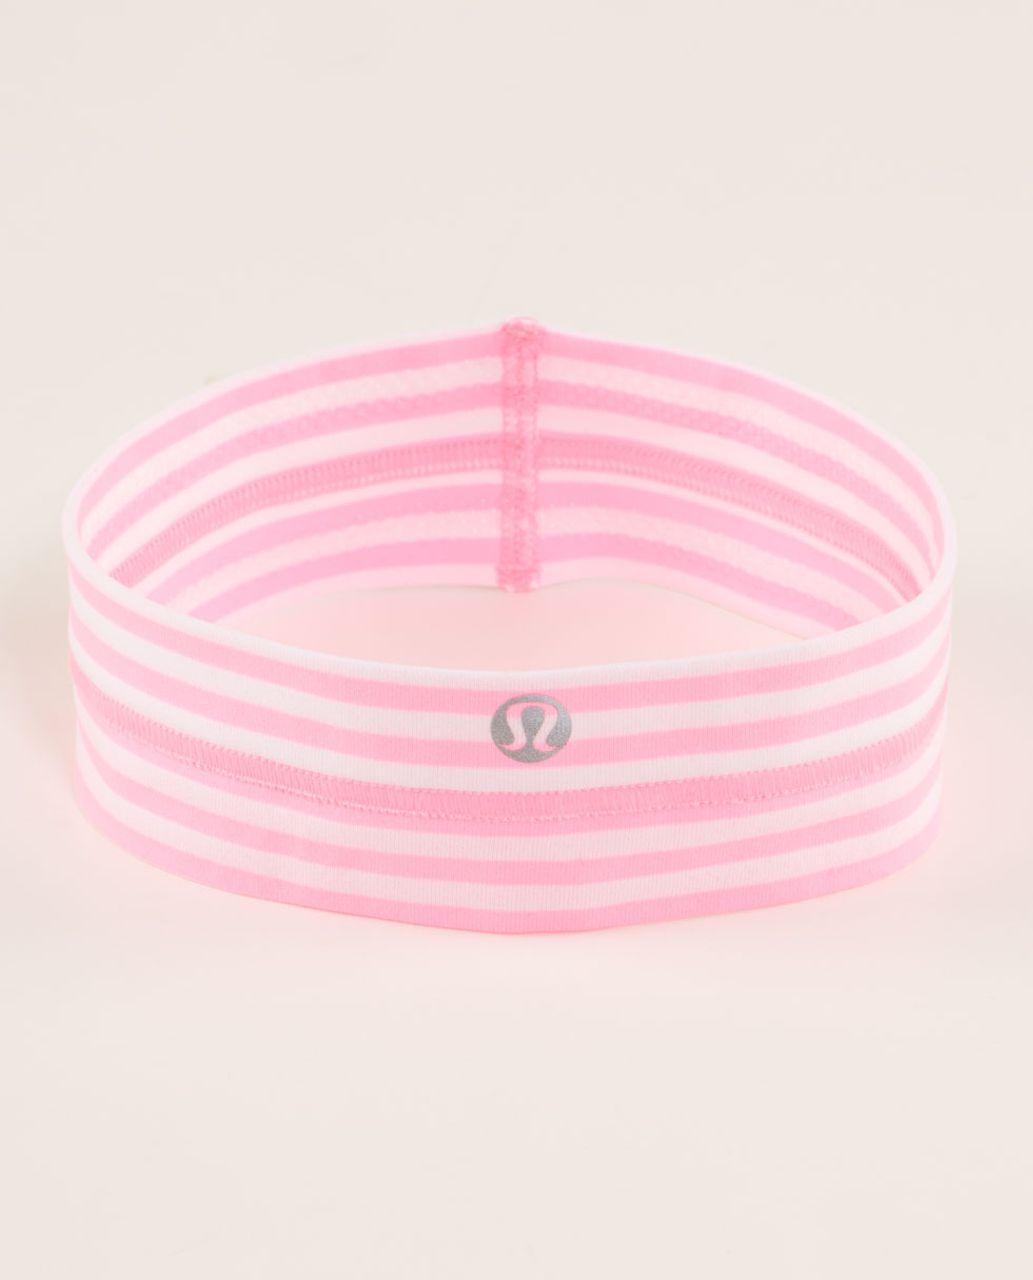 Lululemon Fly Away Tamer Headband - Classic Stripe White Pink Shell